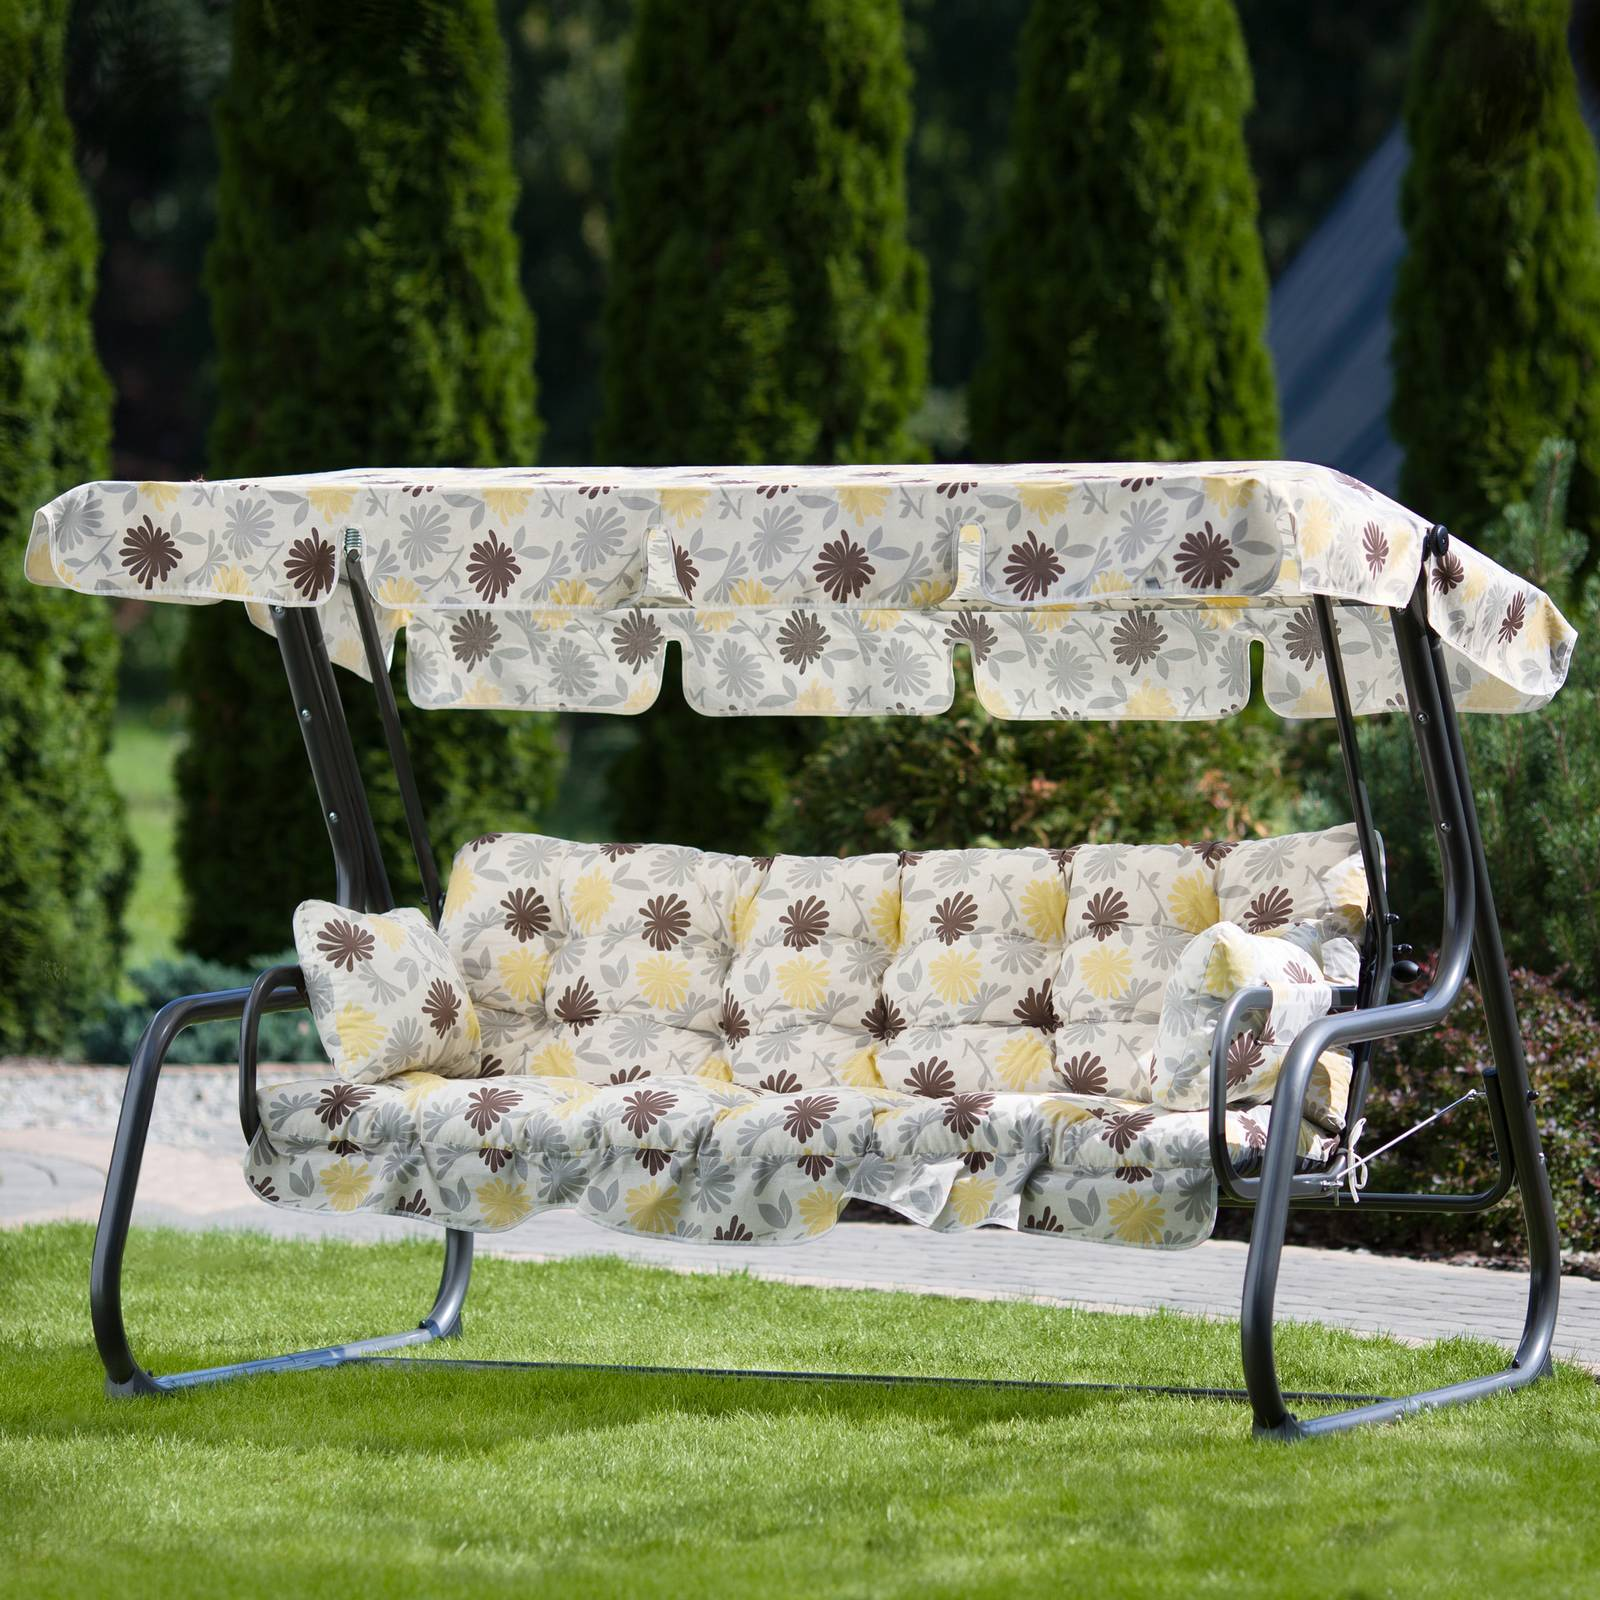 Huśtawka ogrodowa Parma A011-05BB PATIO